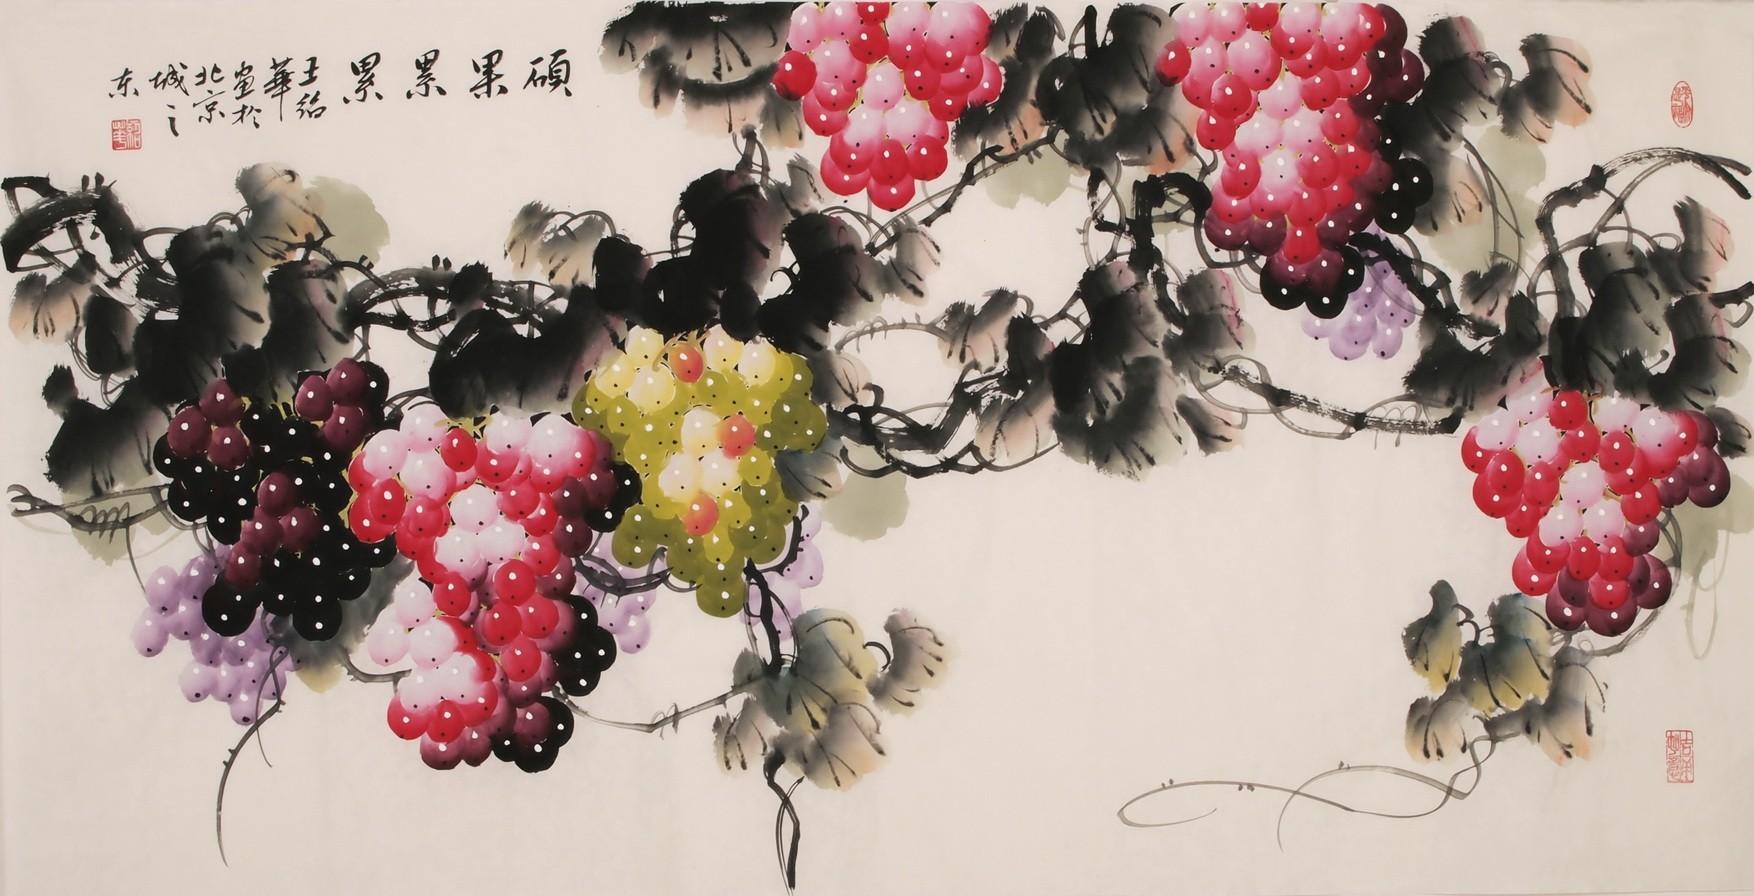 Grapes - CNAG003354